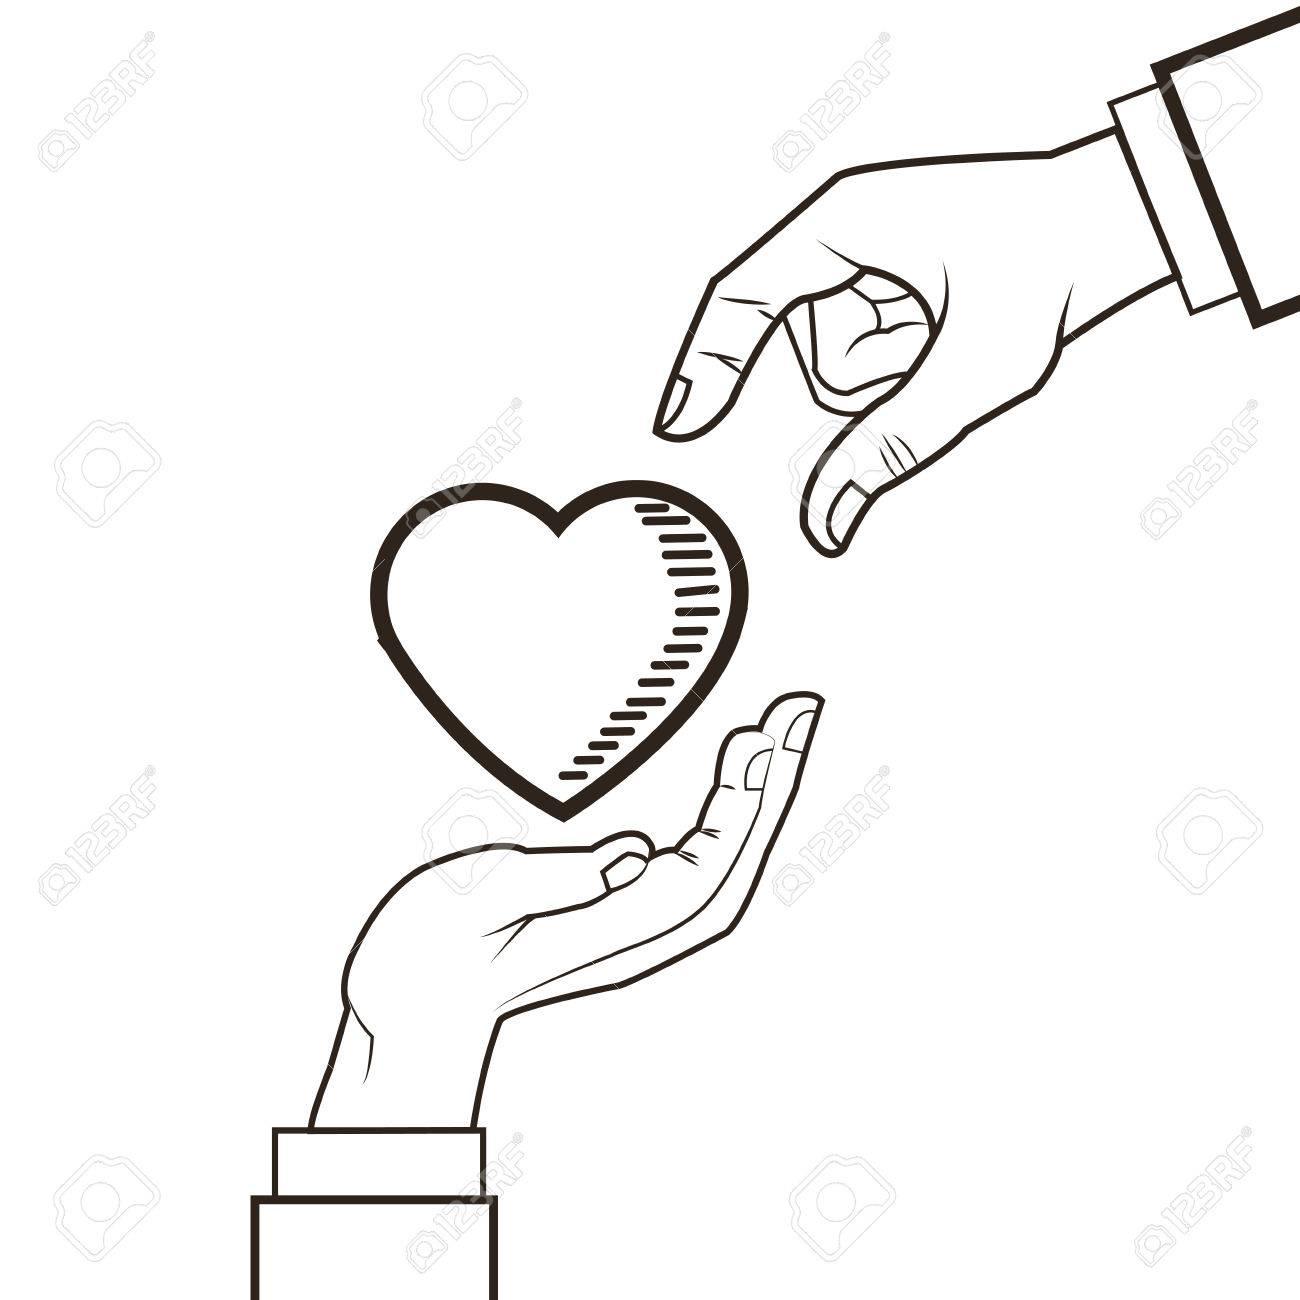 1300x1300 Love Hand Heart Romantic Sketch Icon. Black White Isolated Design